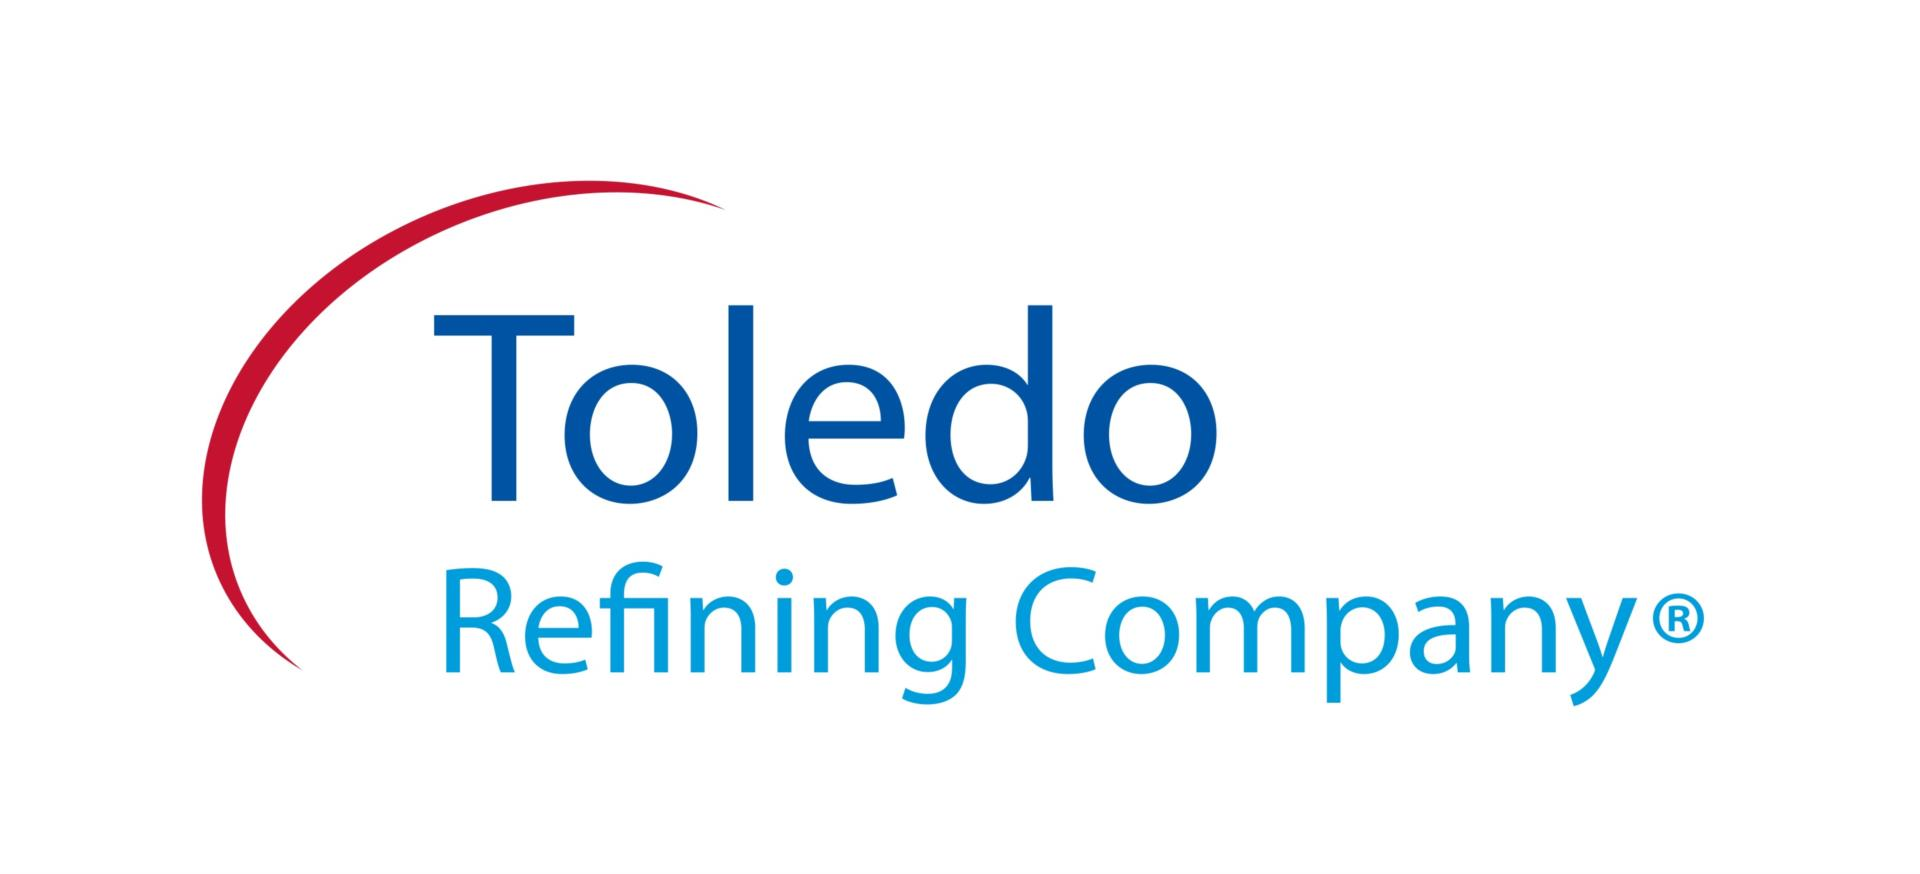 Toledo Refining Company Logo